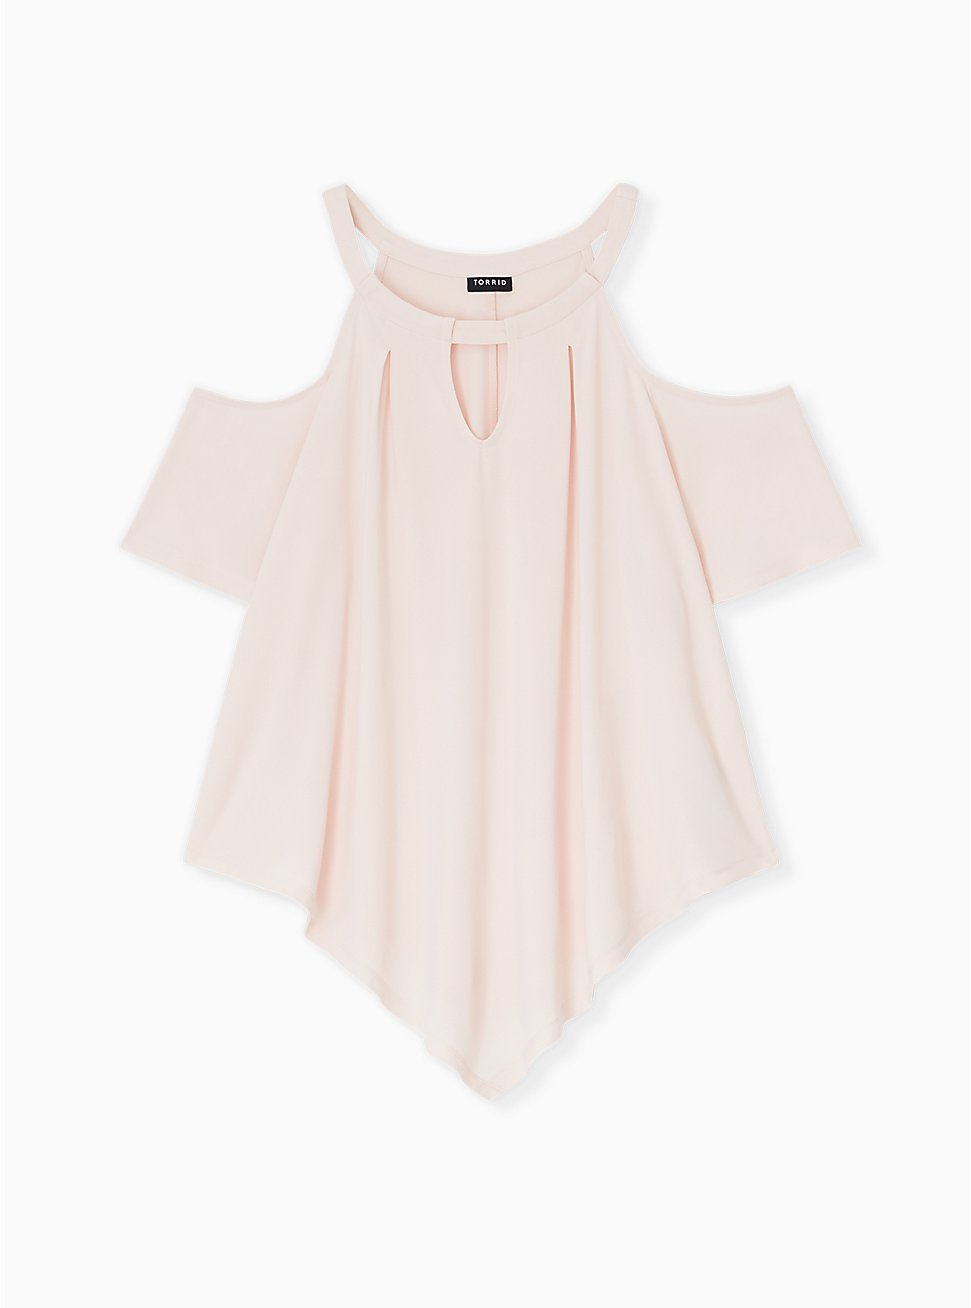 Light Pink Studio Knit Cold Shoulder Blouse, PEACH BLUSH, hi-res